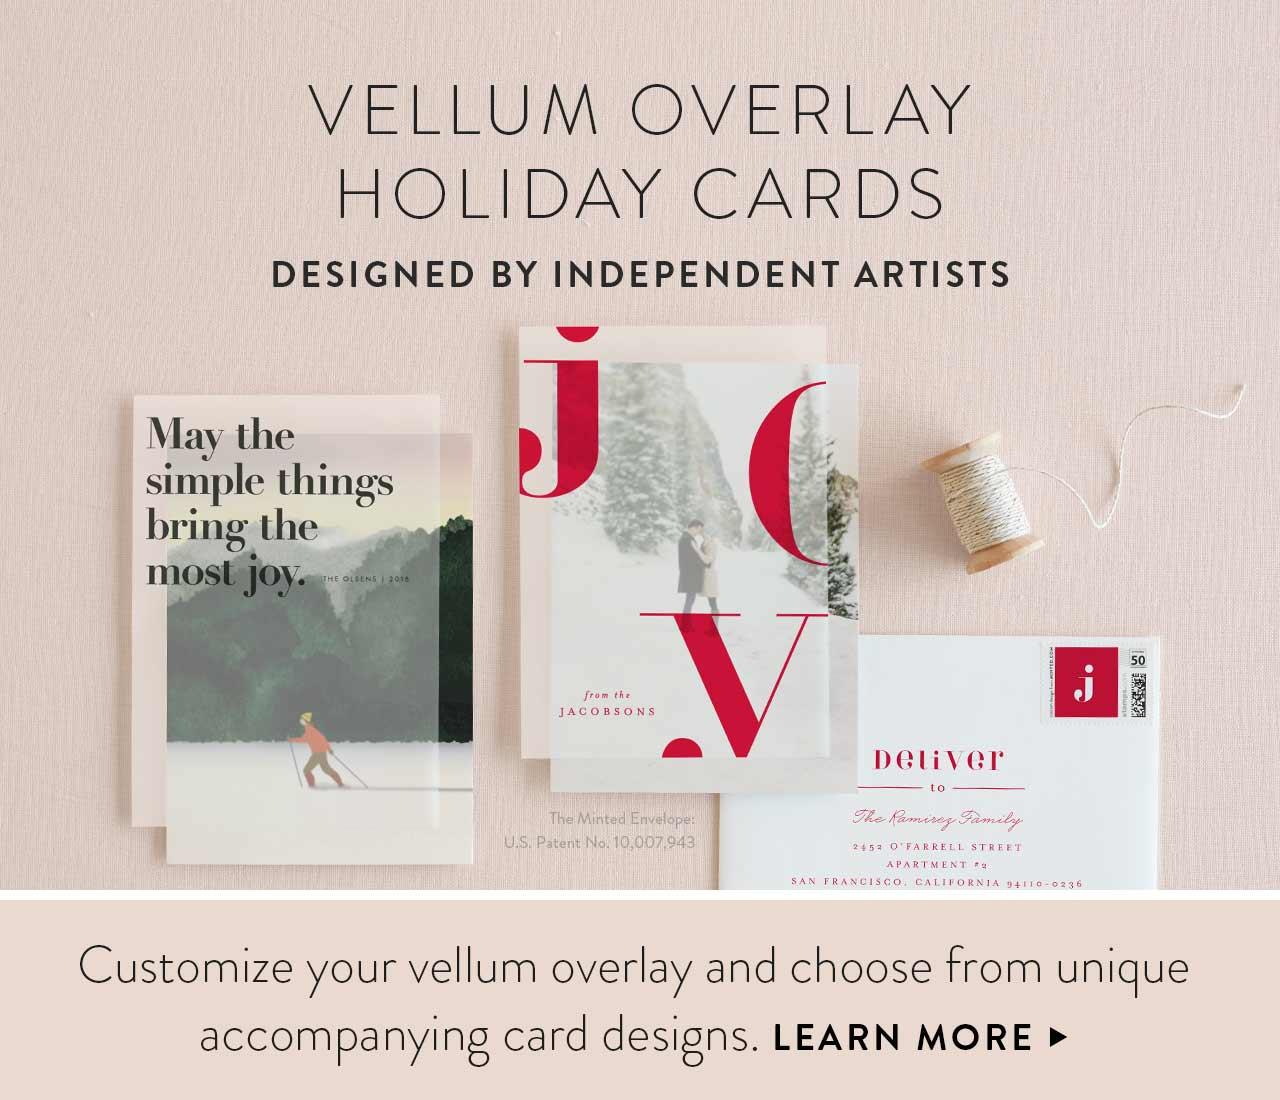 Vellum Holiday Cards